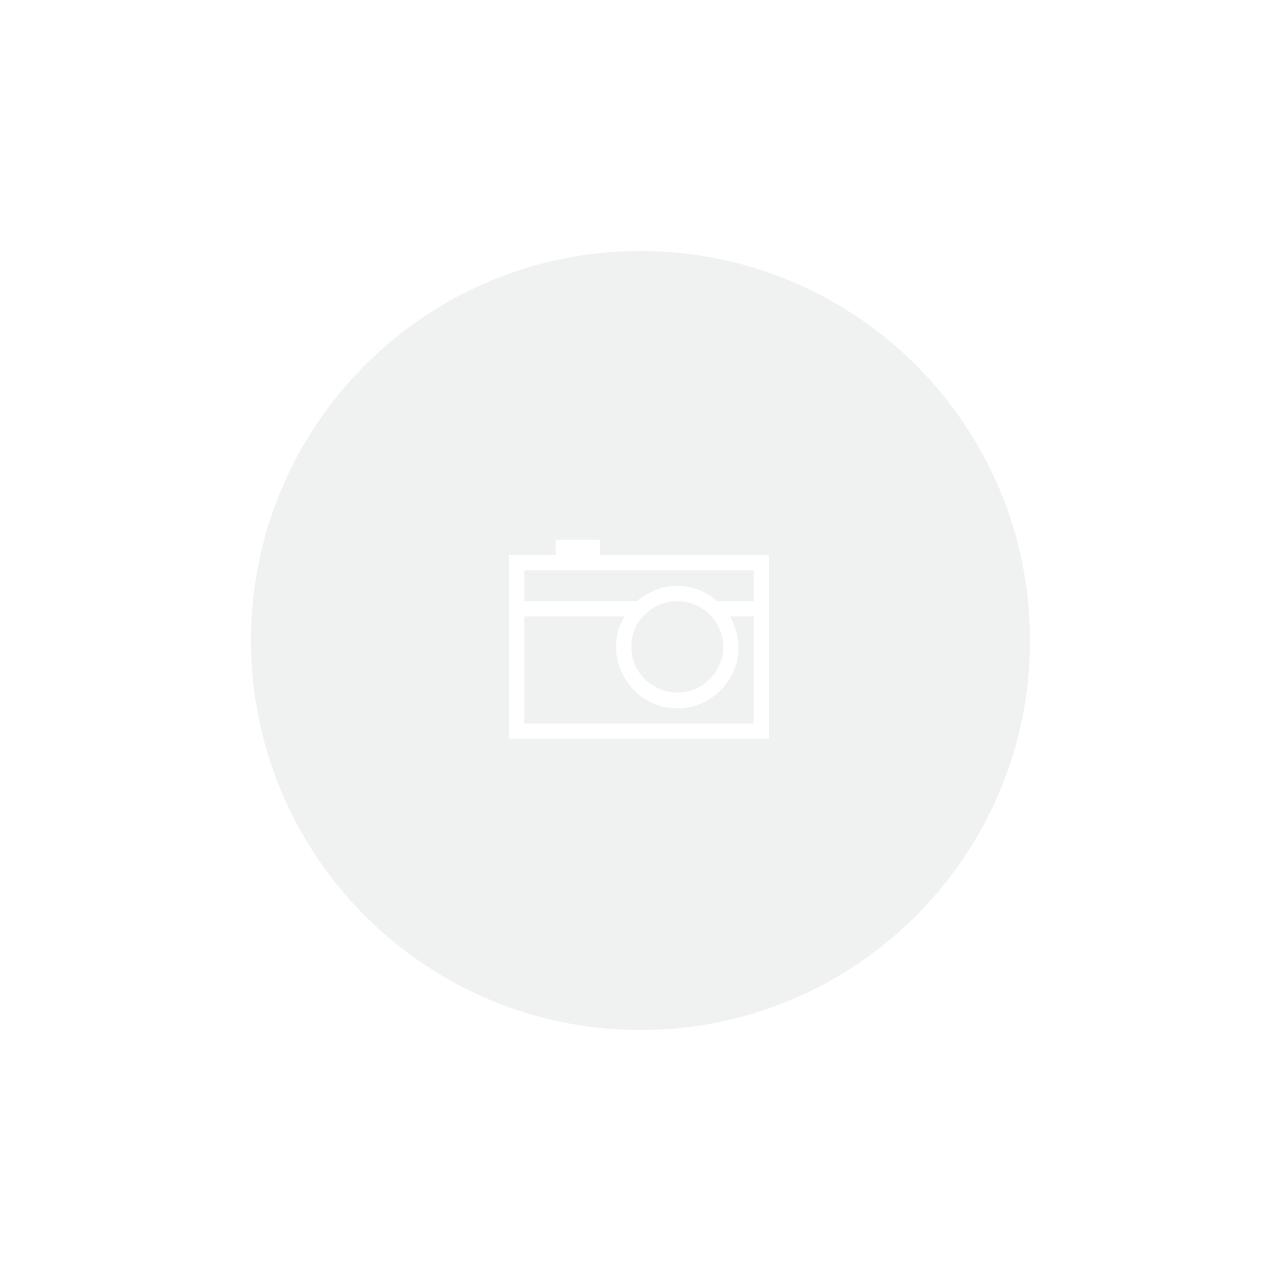 Bandeja Oval Inox Prata 18Cm